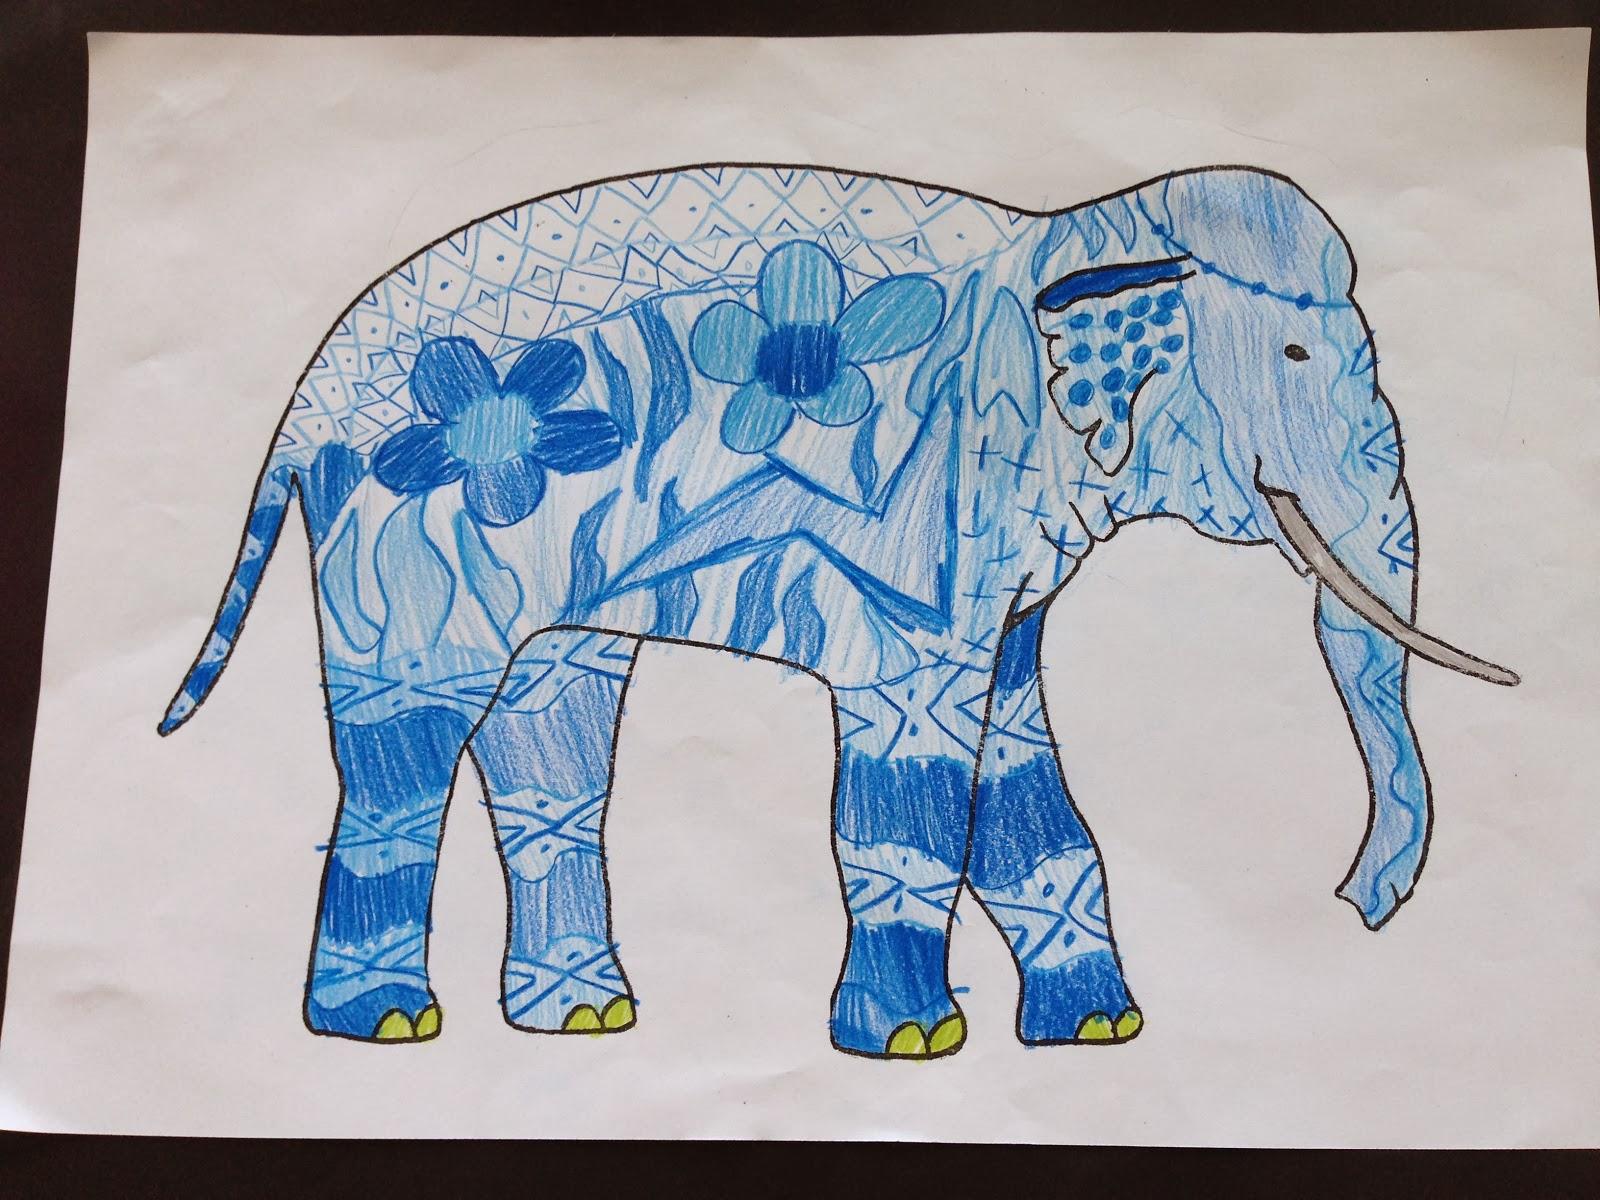 grundschule 2 0 indische elefanten. Black Bedroom Furniture Sets. Home Design Ideas